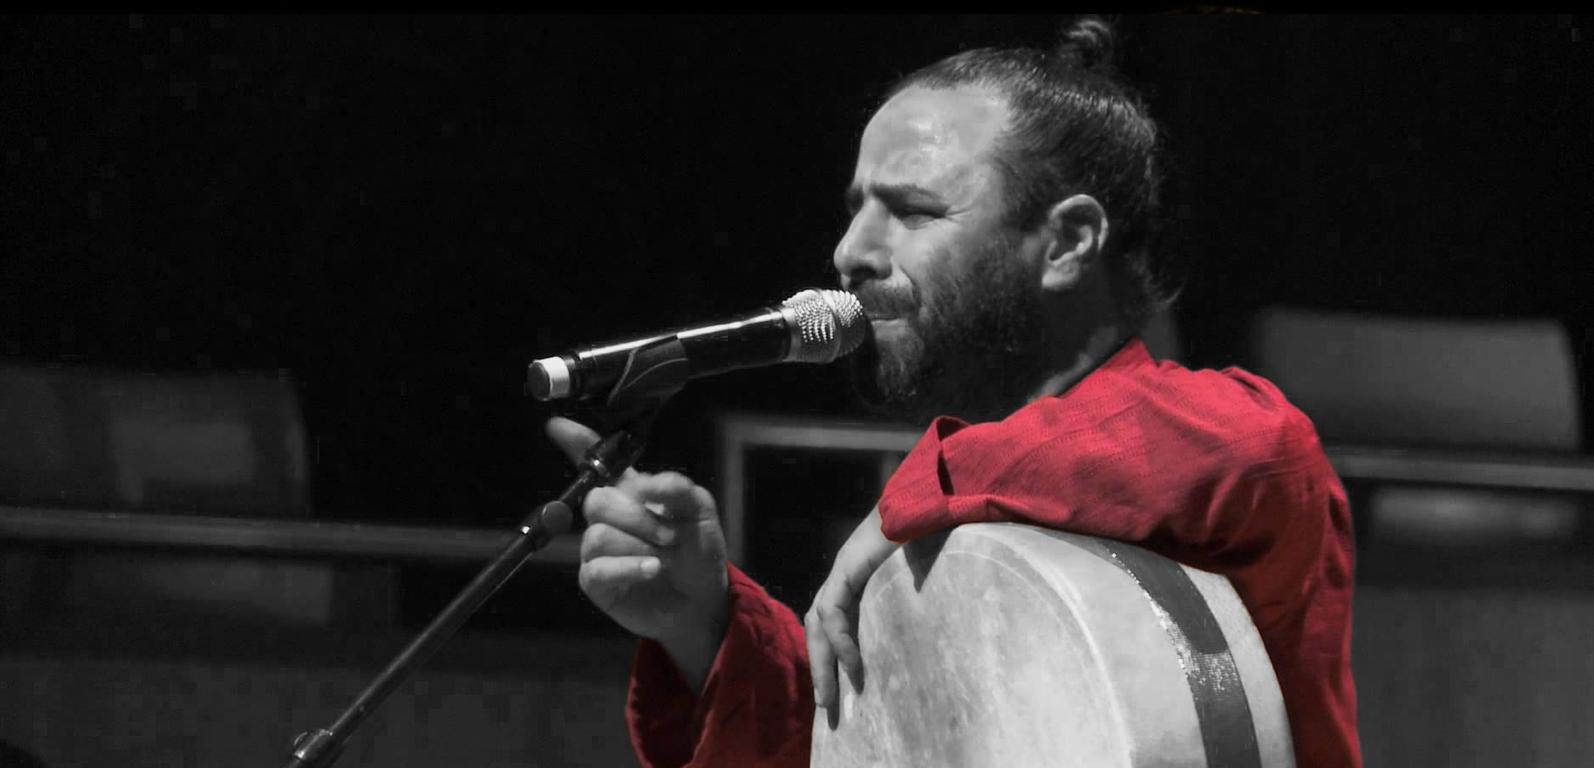 The Magnanimous Voice of Mounir Troudi